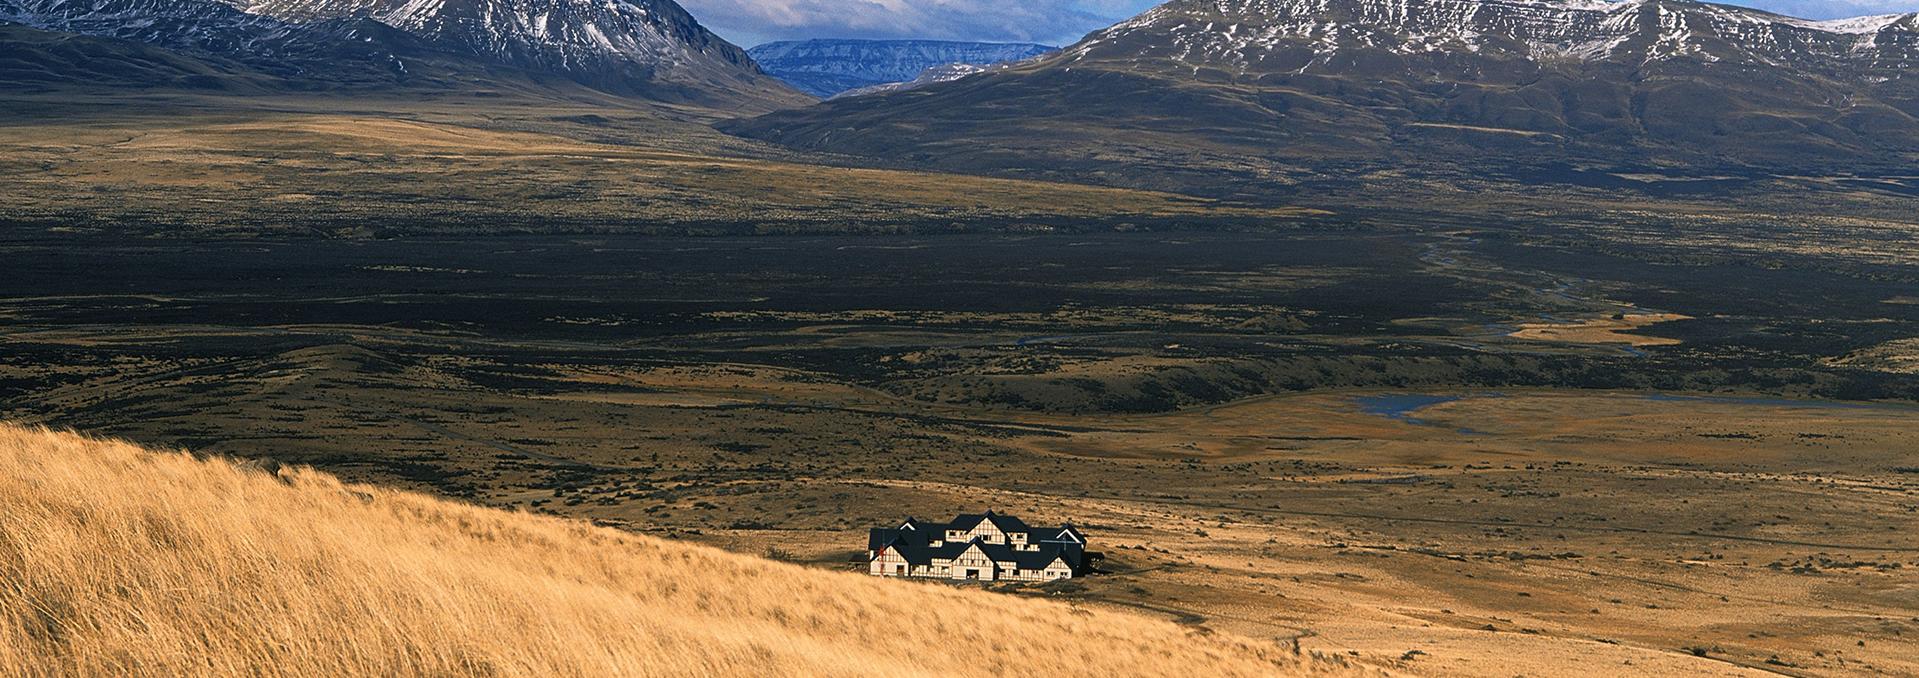 Eolo Patagonia's Spirit (Argentina)